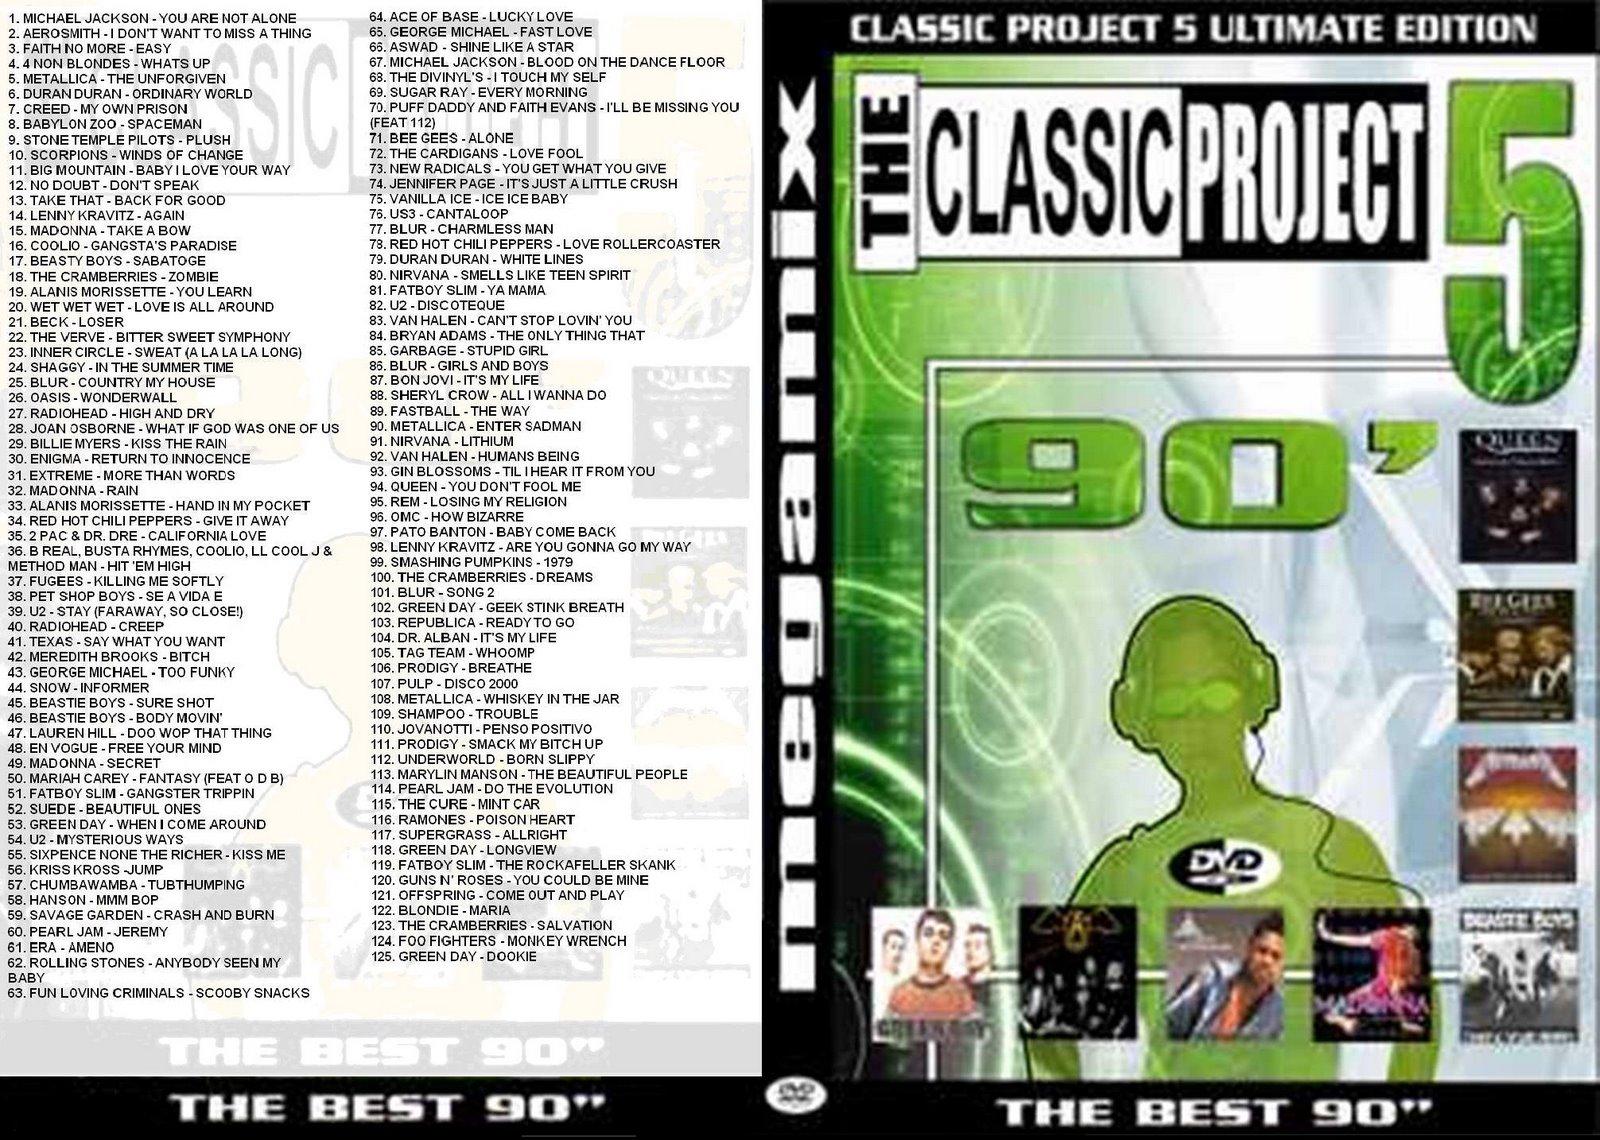 http://3.bp.blogspot.com/_iMOkHyydMzo/S7P_2_WaunI/AAAAAAAAAcE/qhM0_xGmm8k/s1600/classic+proyect+05.jpg